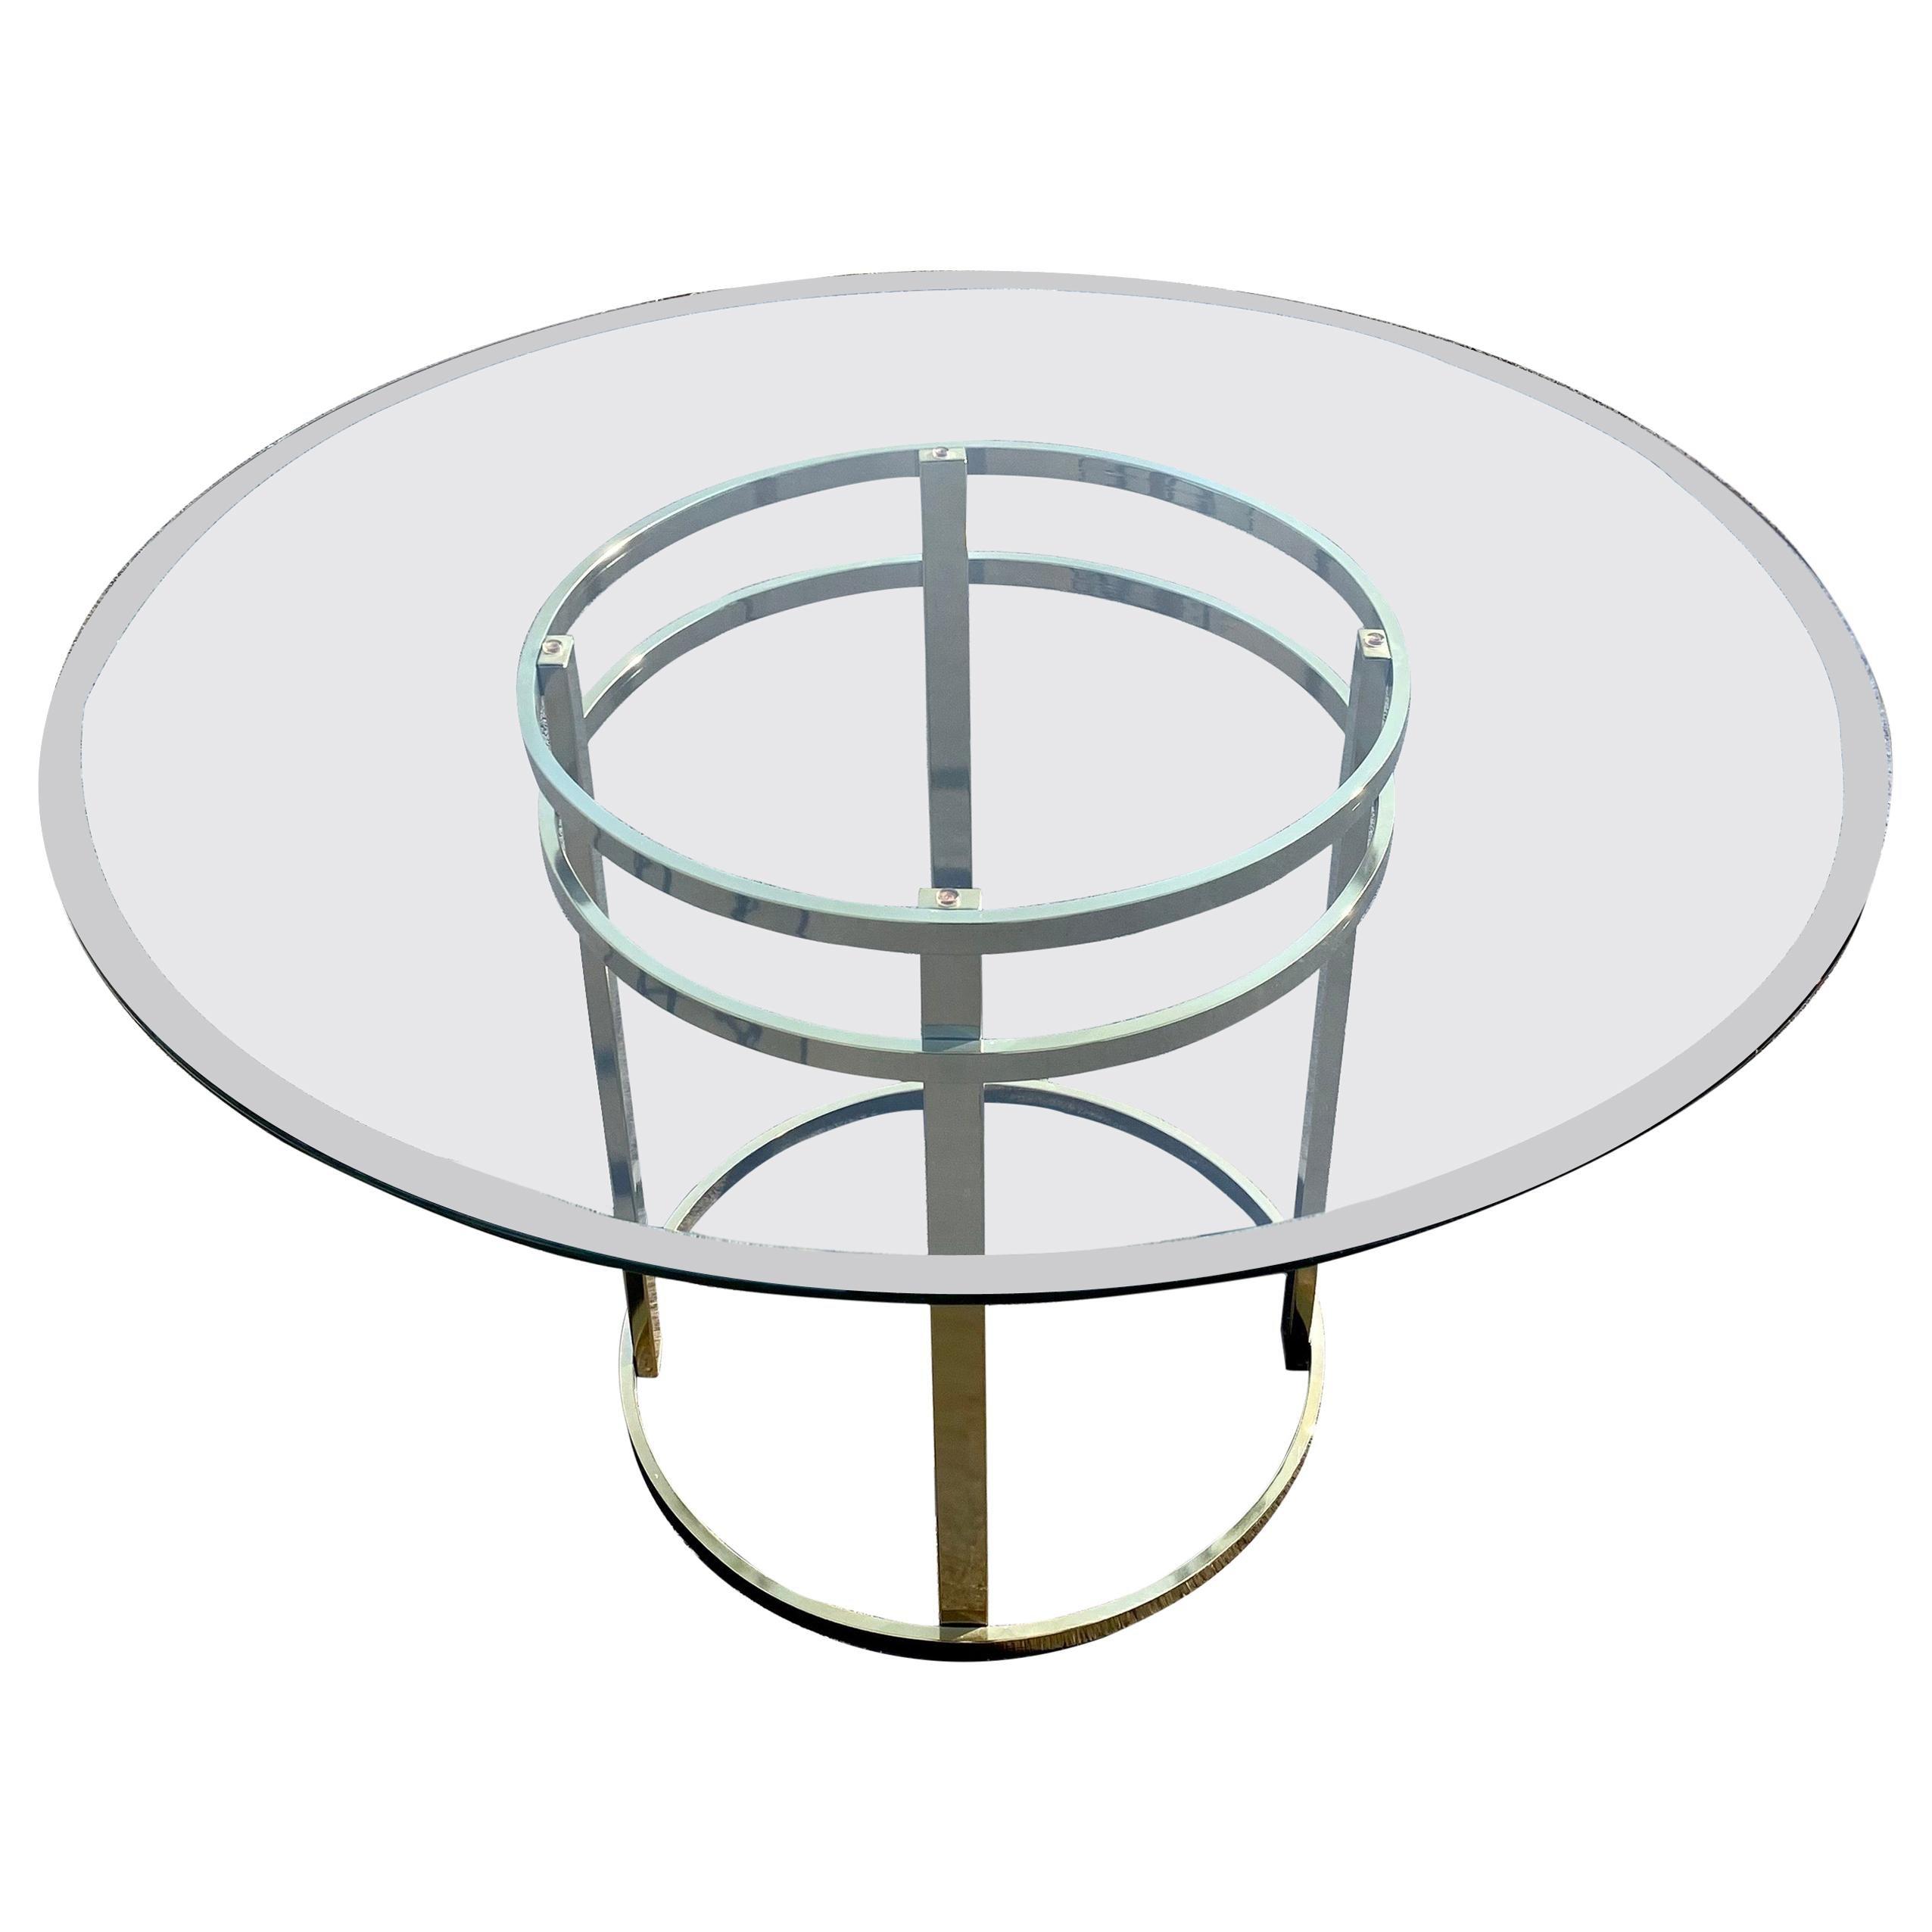 Mid-Century Modern Milo Baughman Style Brass Glass Round Dining Table